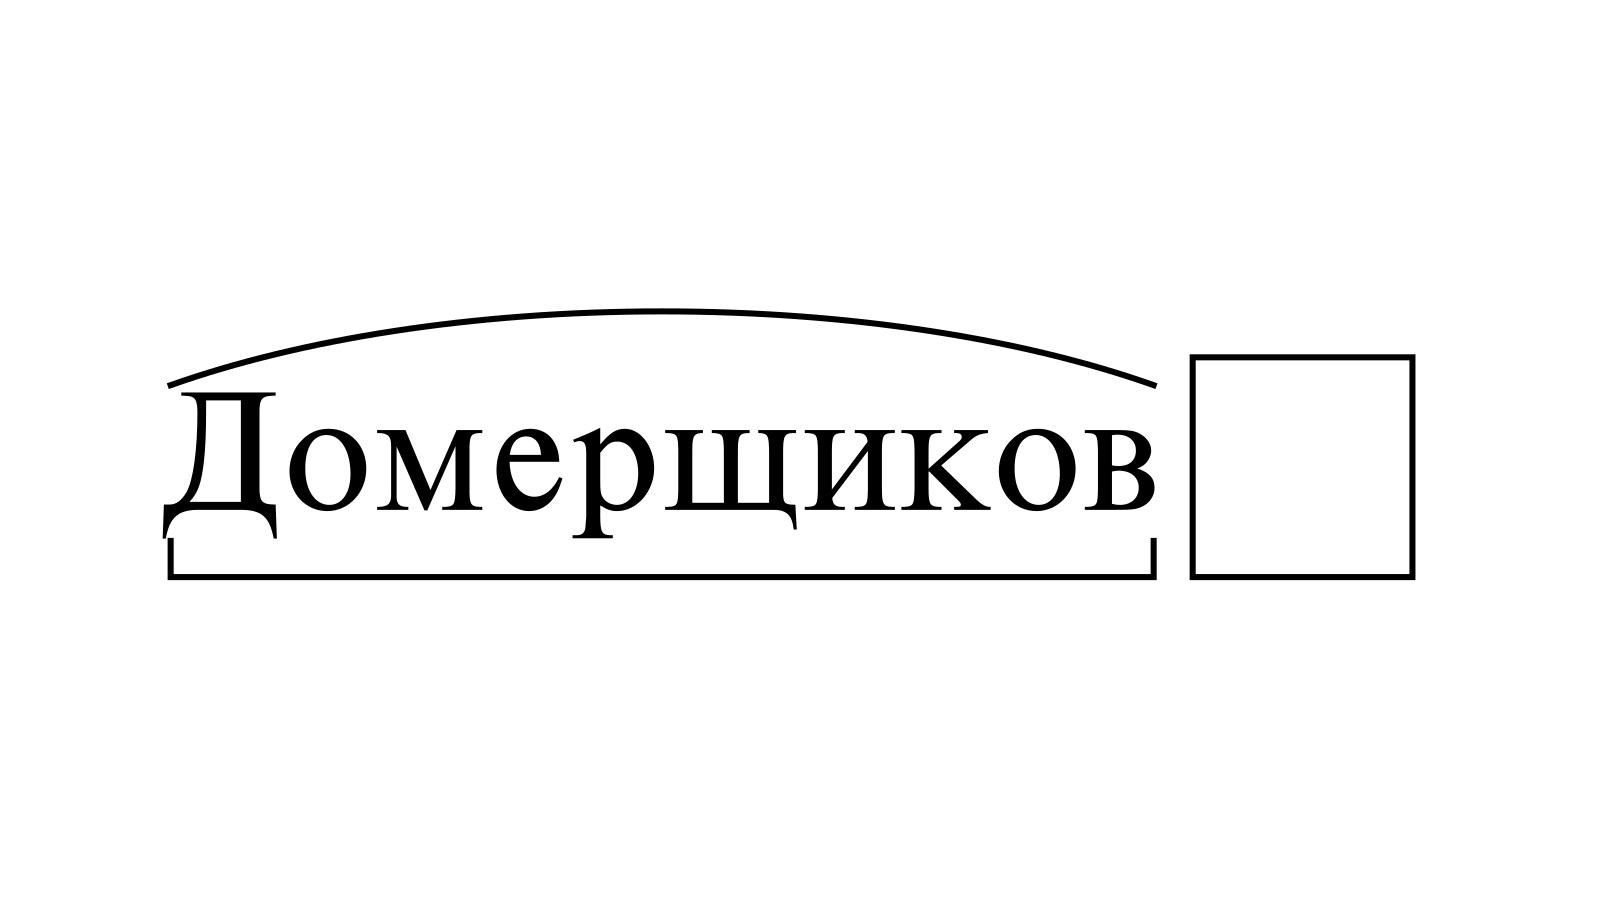 Разбор слова «Домерщиков» по составу